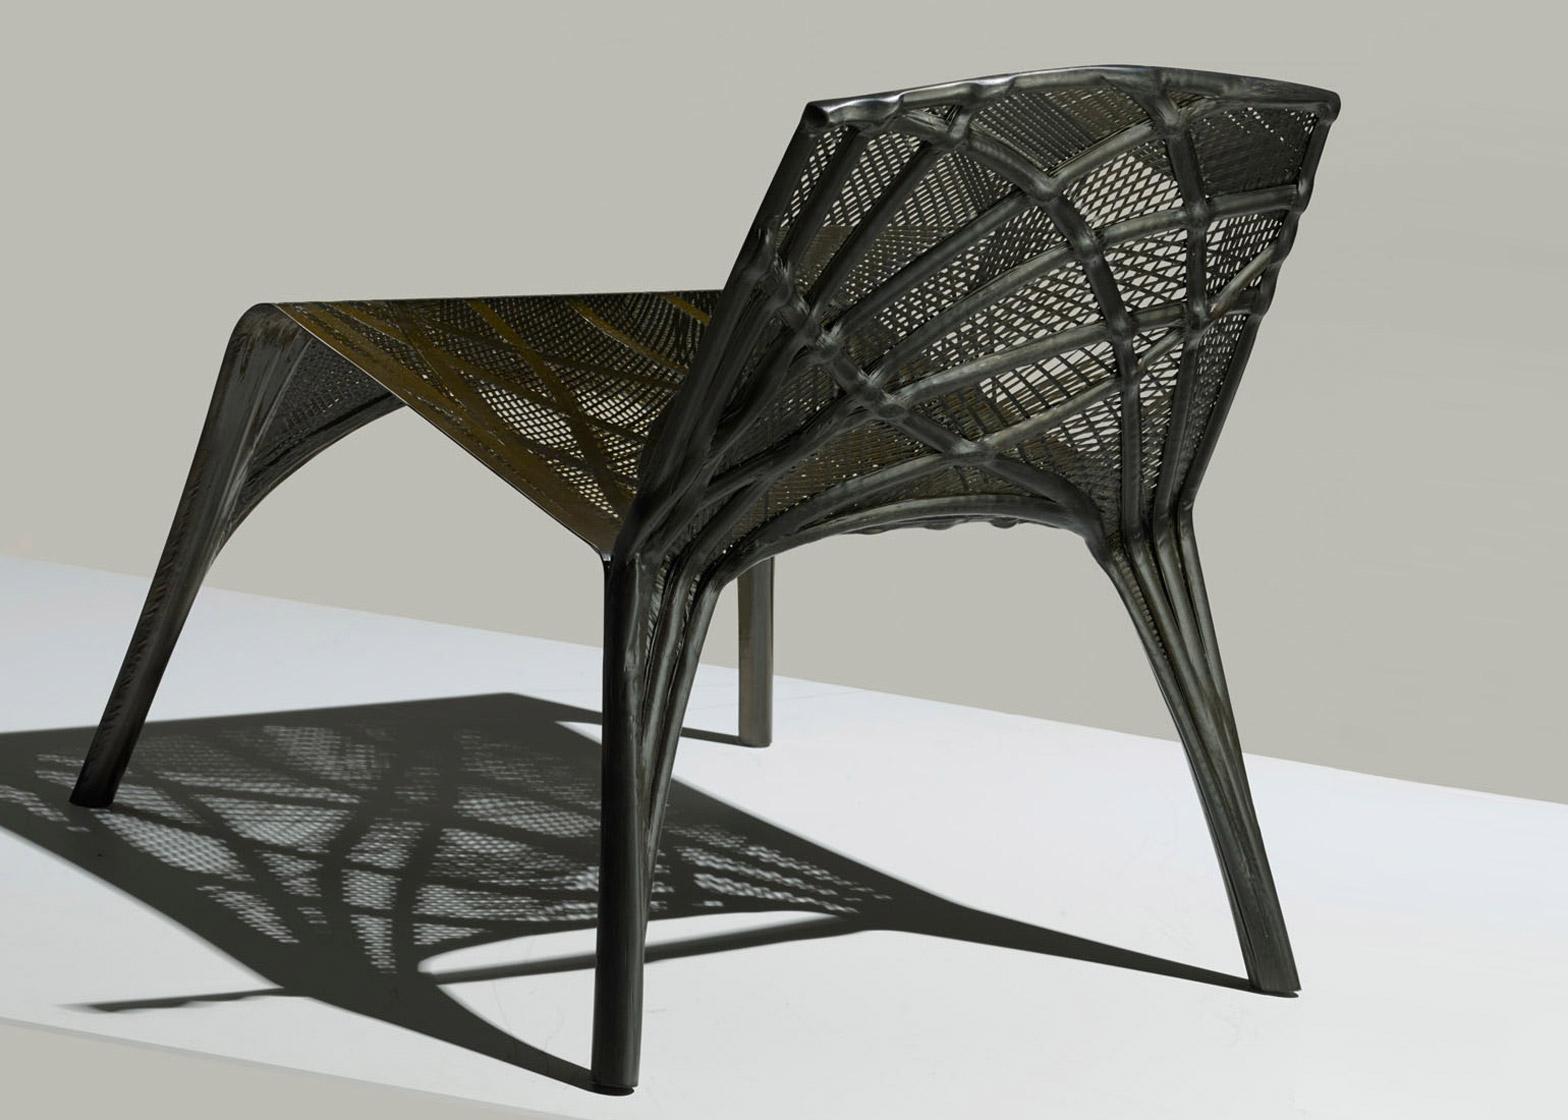 fiber furniture. Marleen Kaptein Uses Aerospace Robots To Craft Carbon-fibre Chair Fiber Furniture I